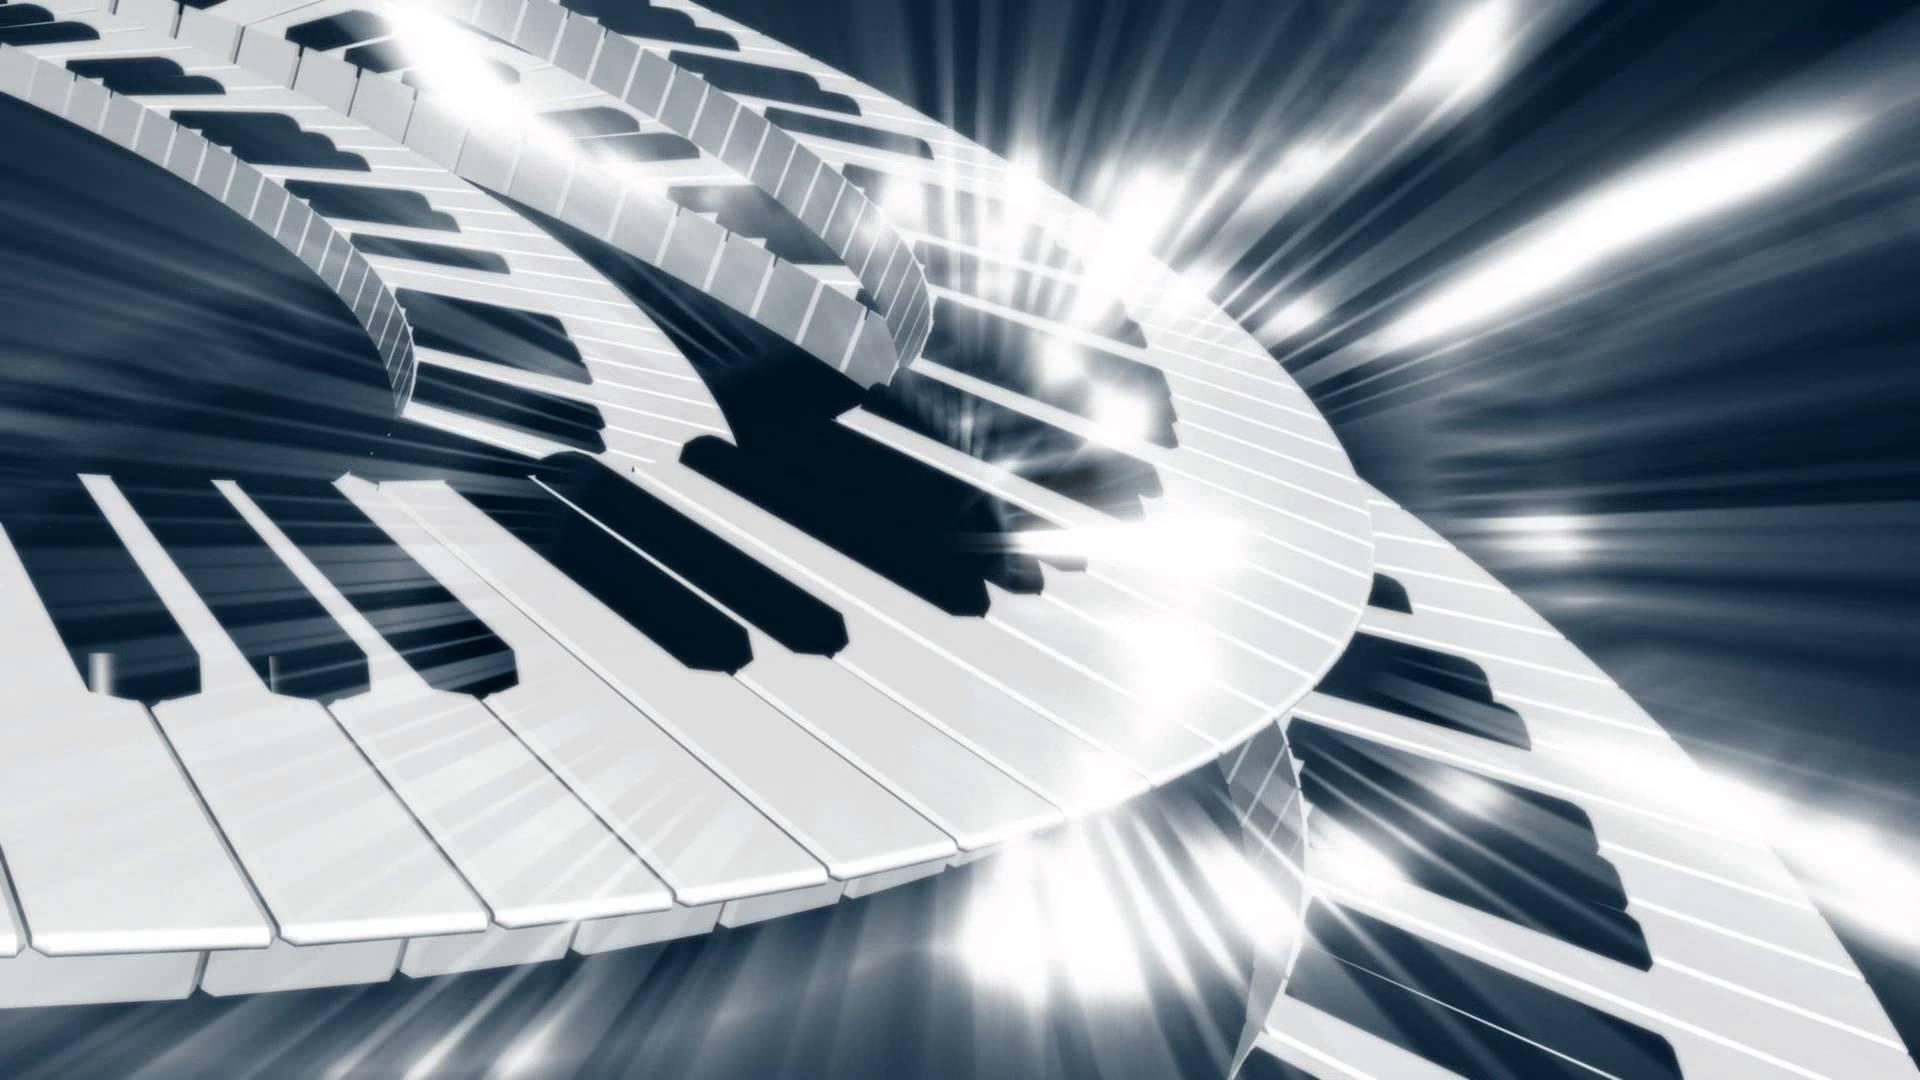 Music Keyboard PNG HD-PlusPNG.com-1920 - Music Keyboard PNG HD